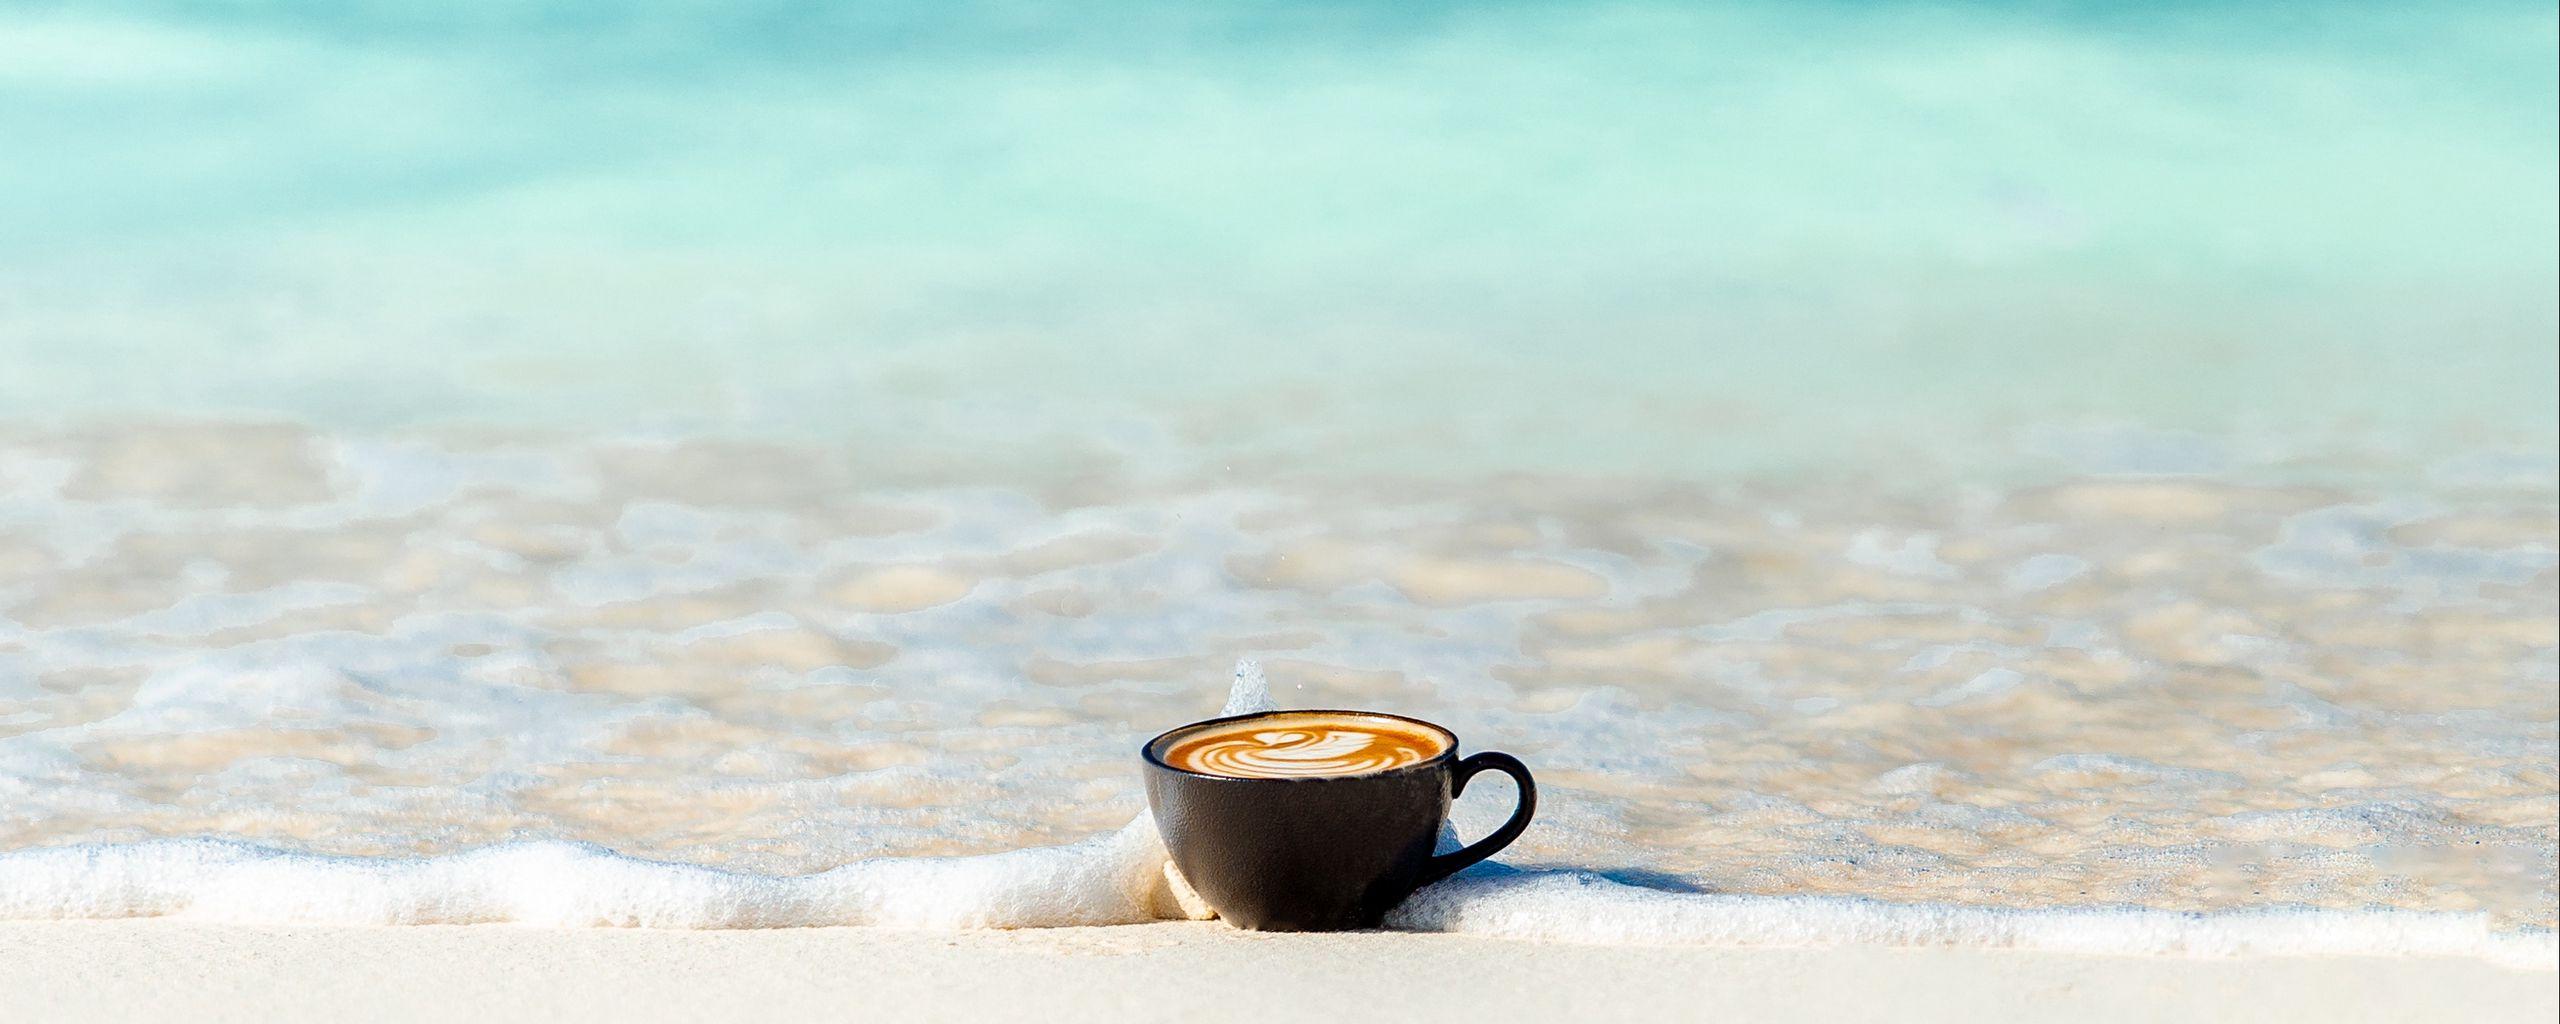 2560x1024 Wallpaper cup, ocean, sand, coast, minimalism